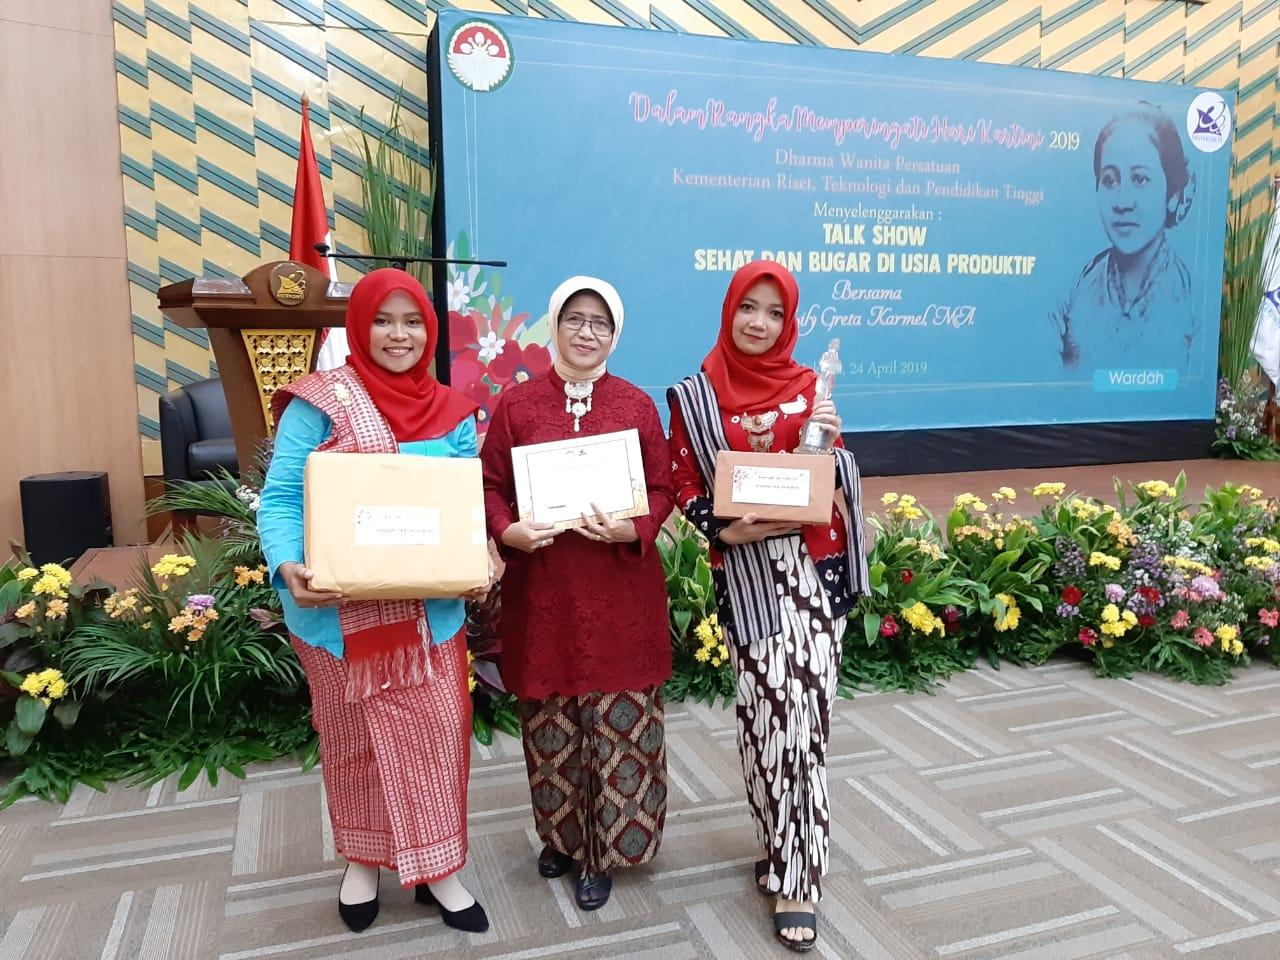 Dulang Juara Favorit, DWP UNNES Semakin Eksis